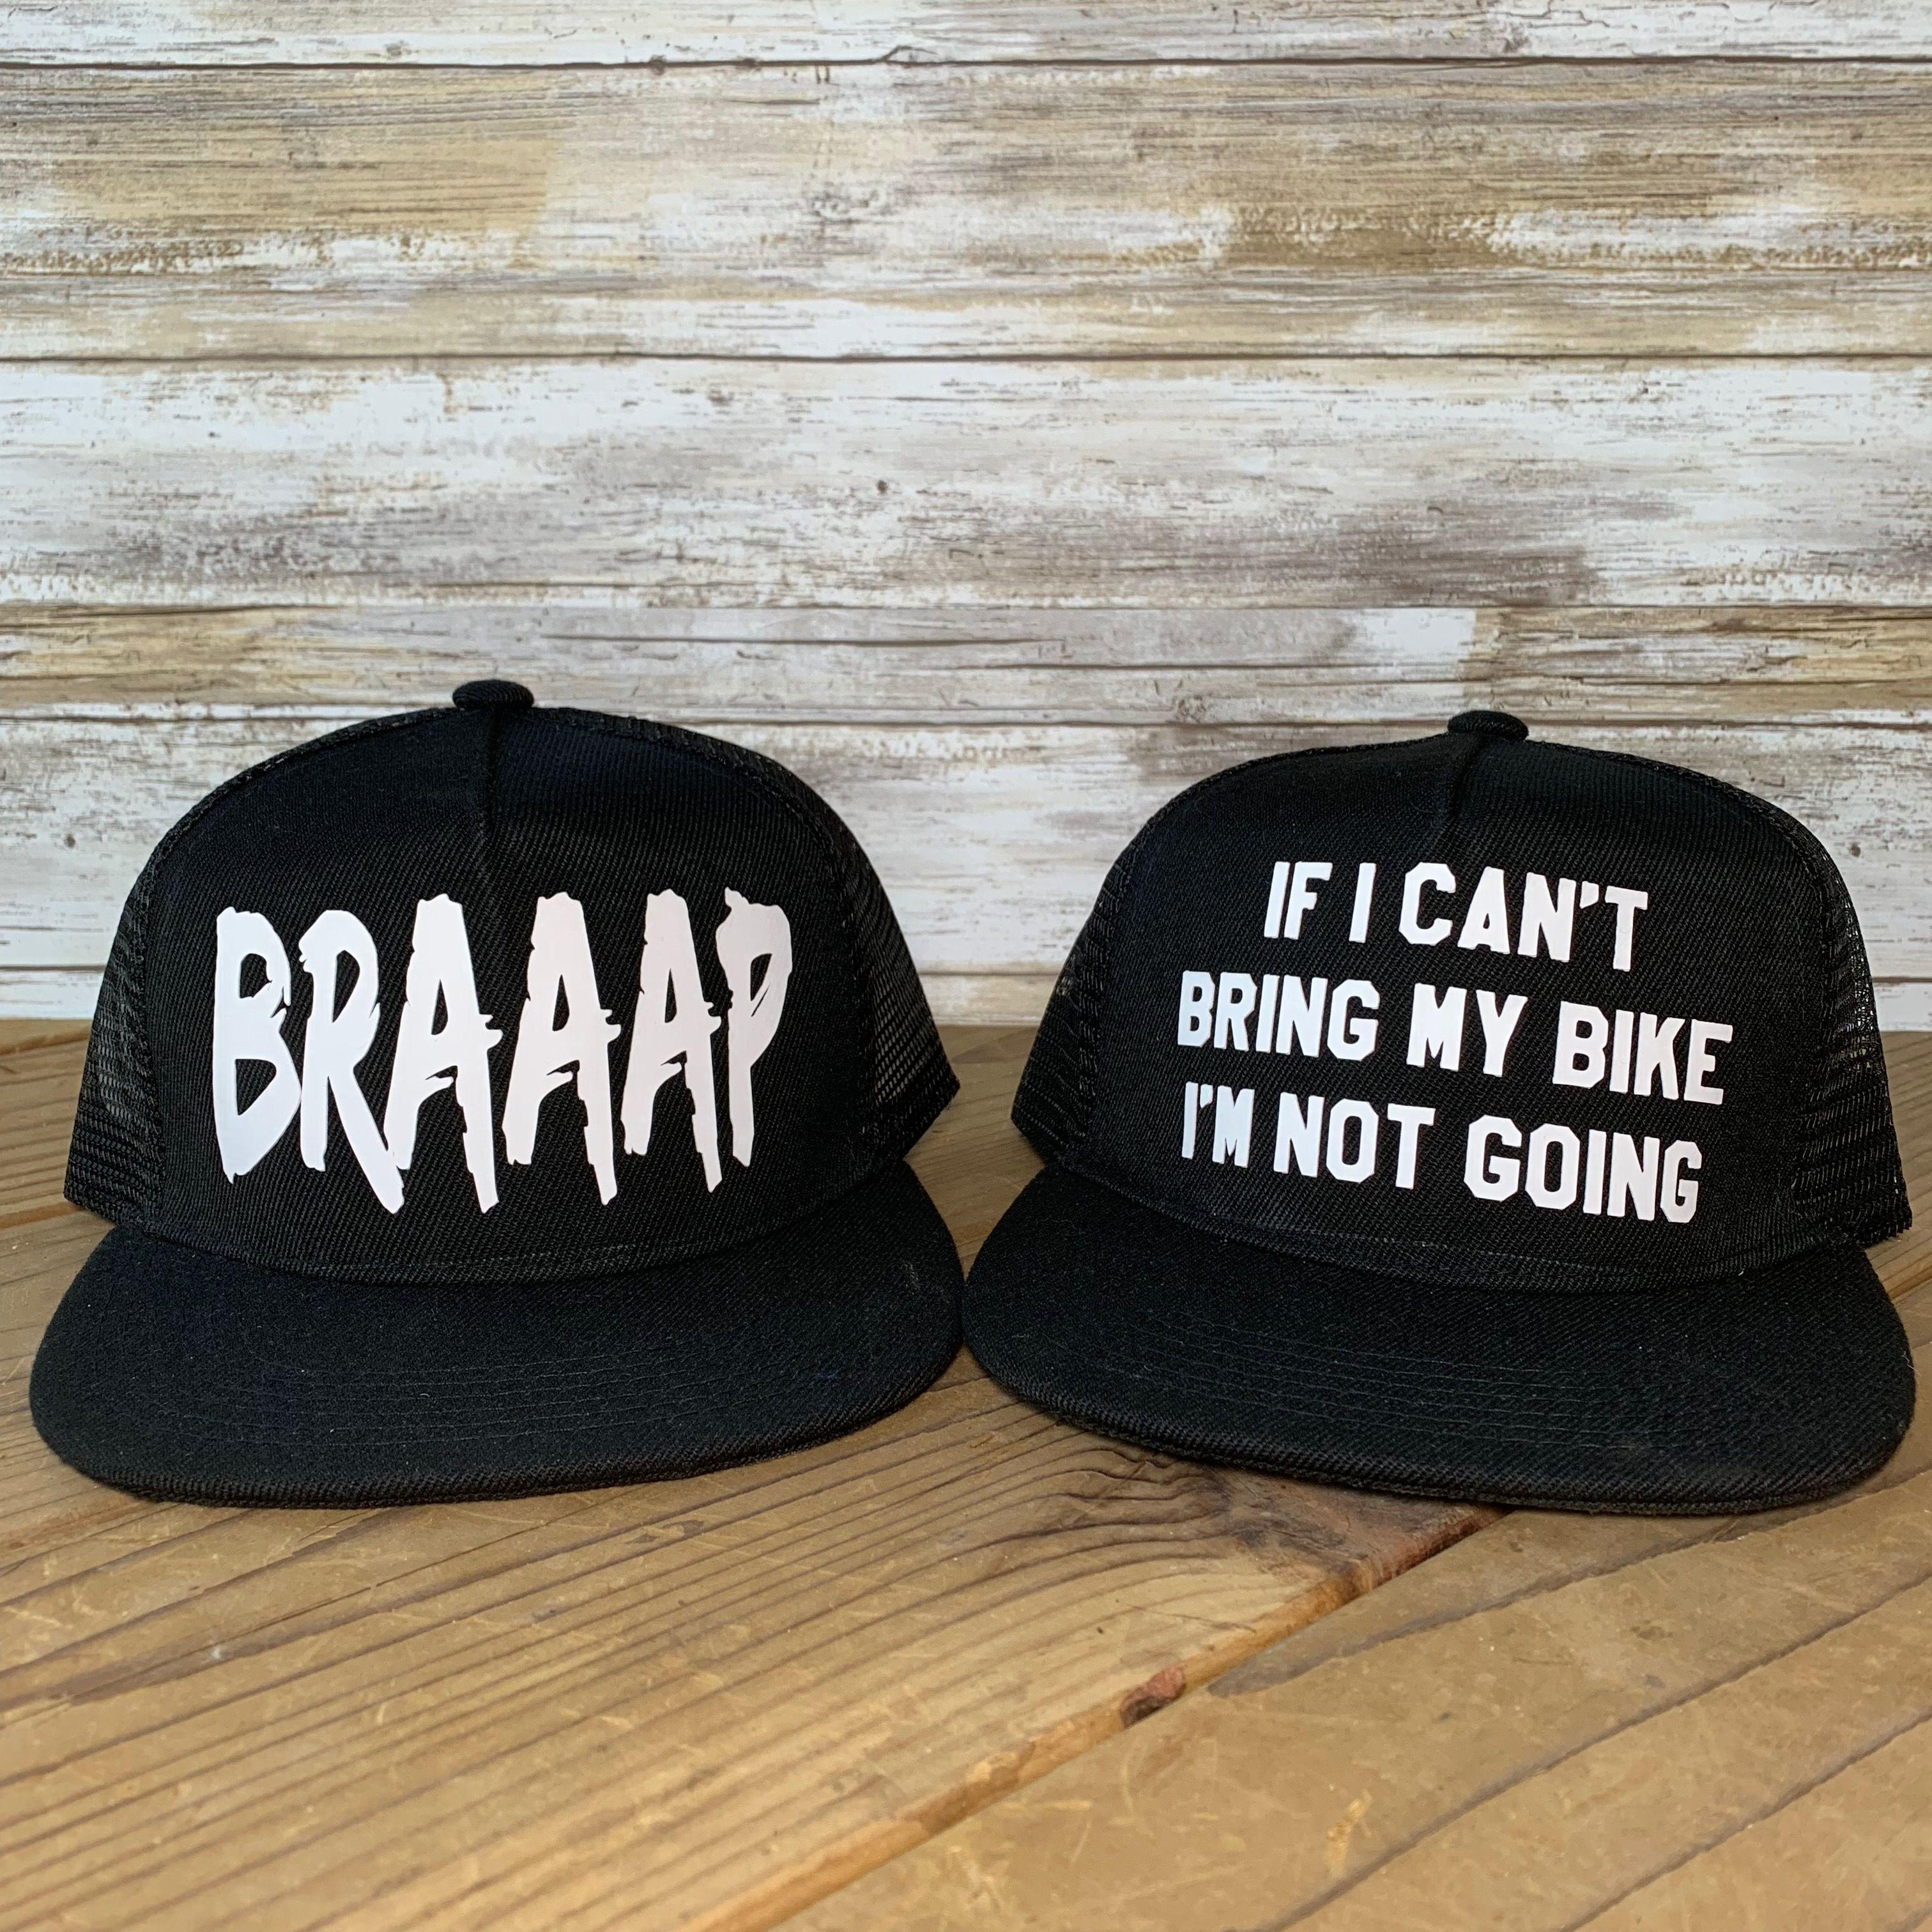 Mens Womens Baseball Hat Im from Ohio and Im Awesome Snapback Custom Cap